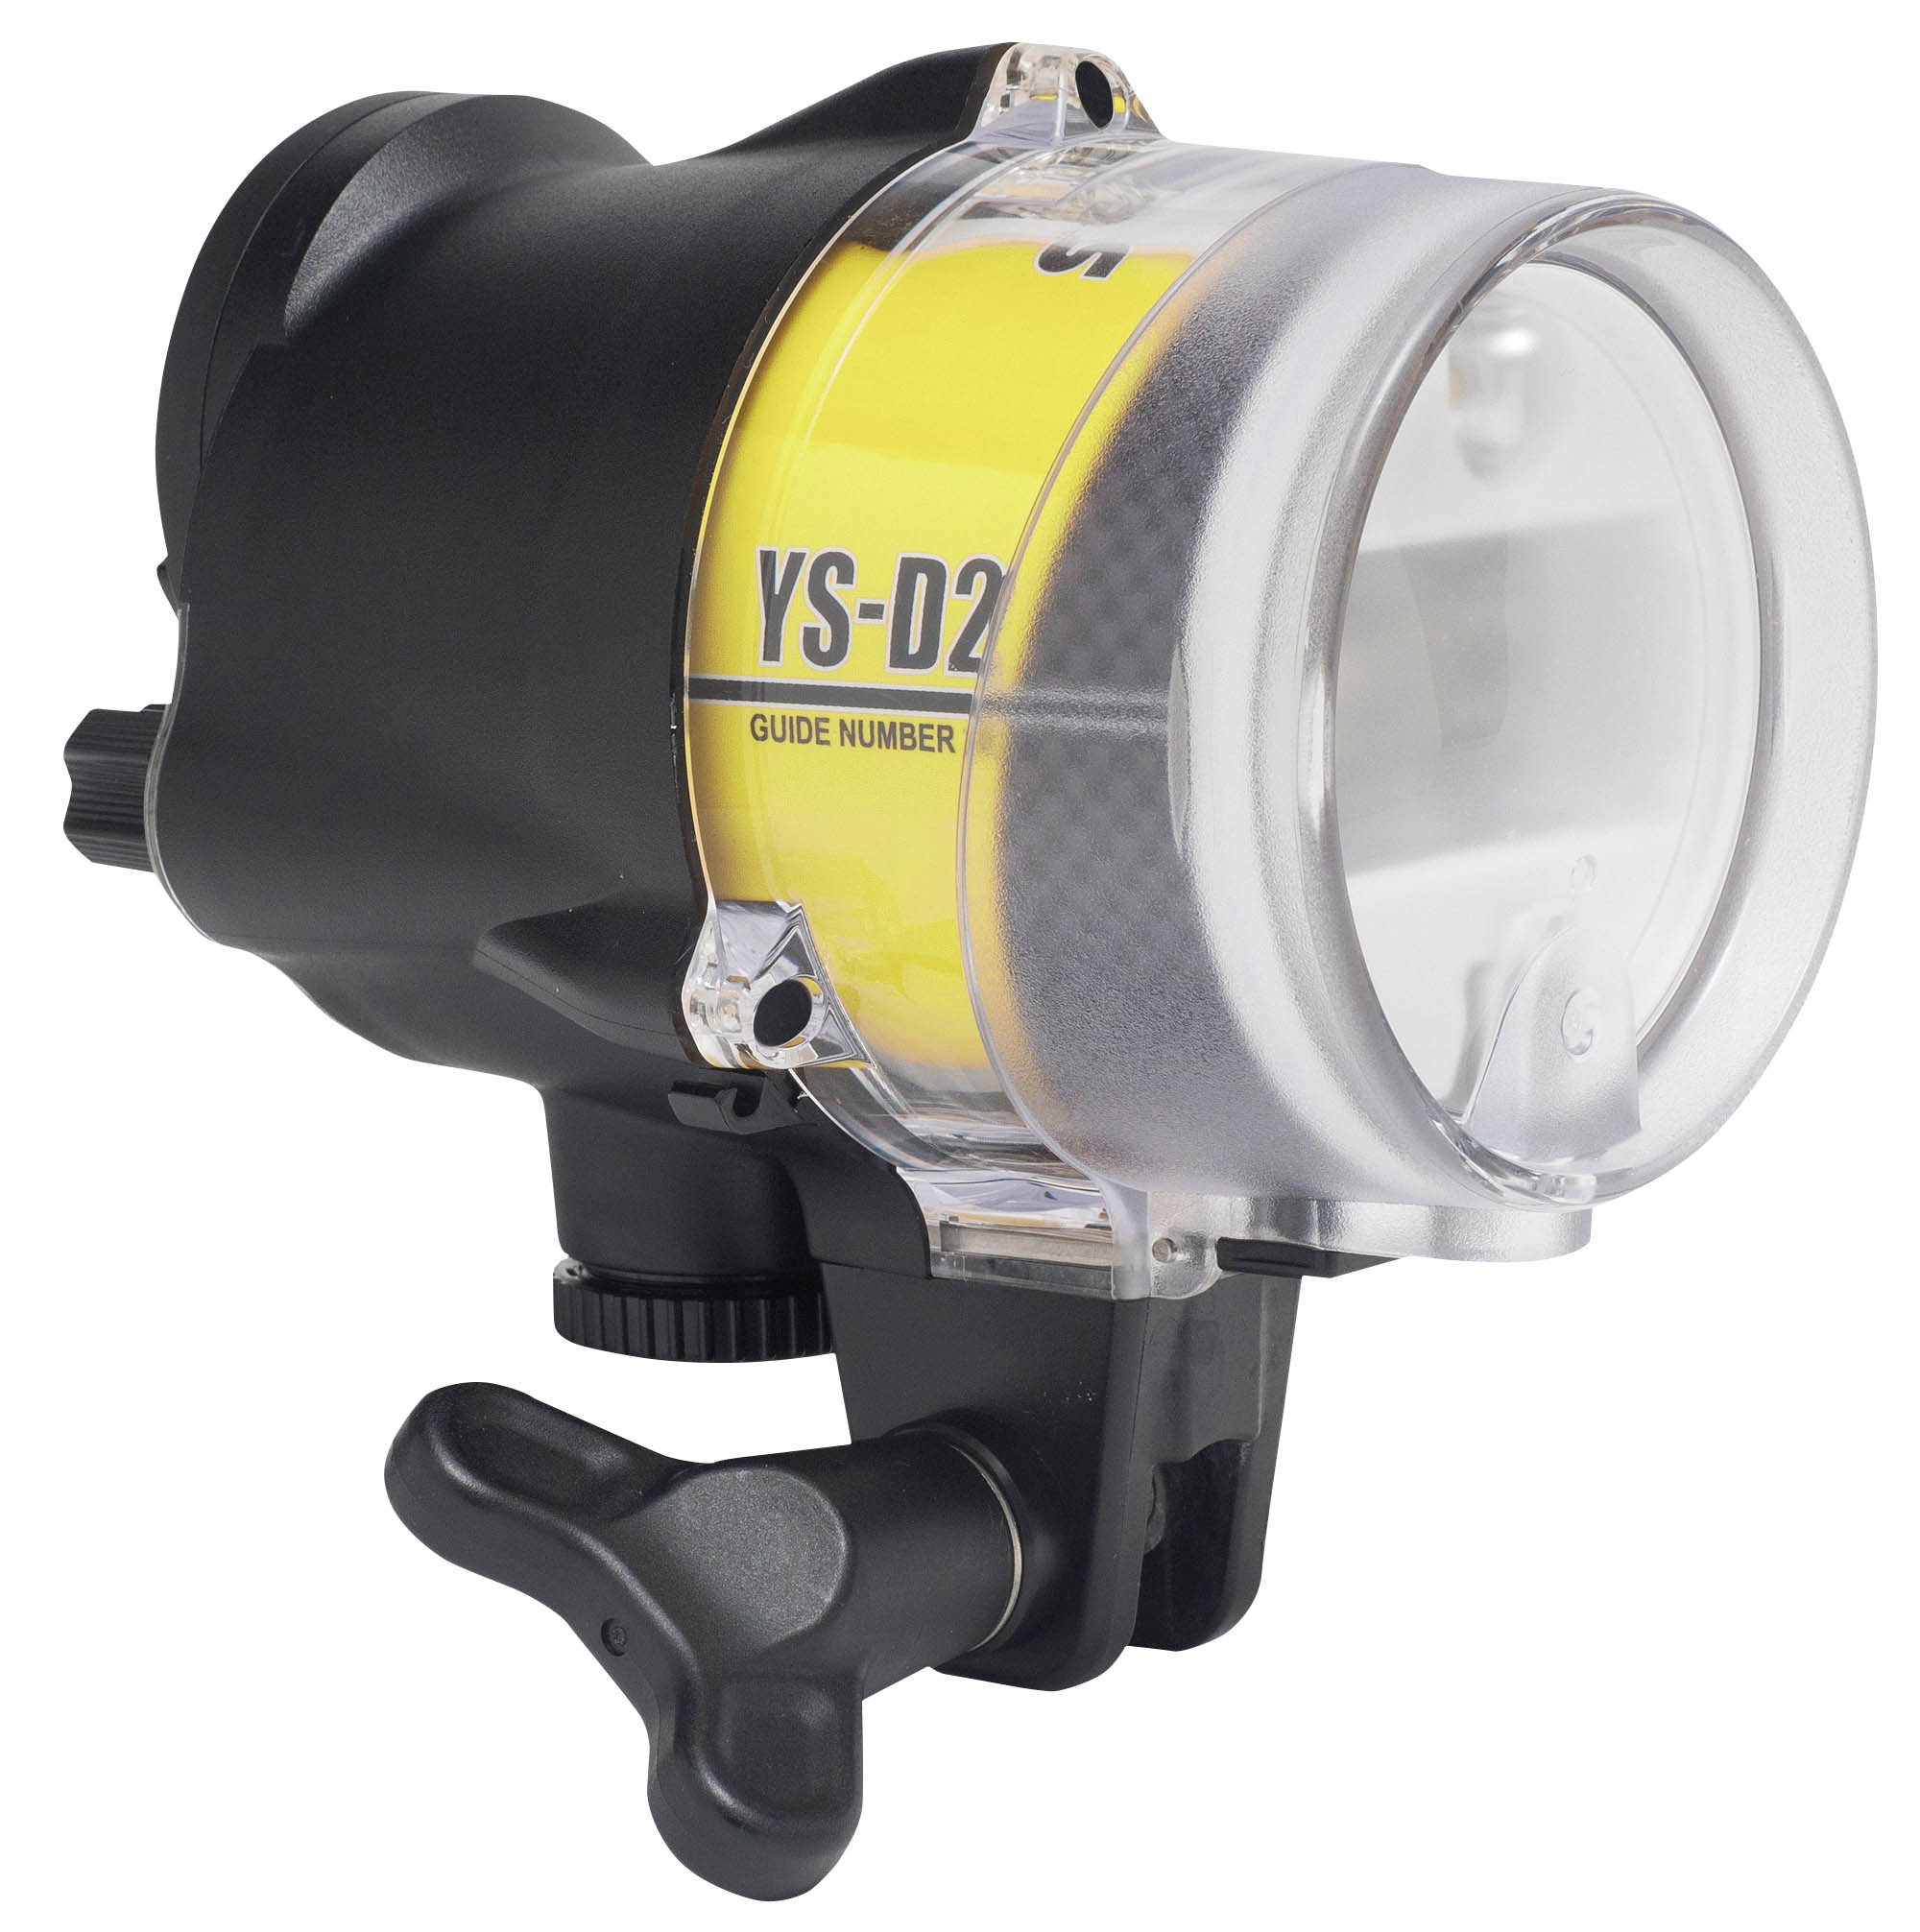 YS-D2 (03121) ・光ファイバーケーブルII M/2コネクターセット